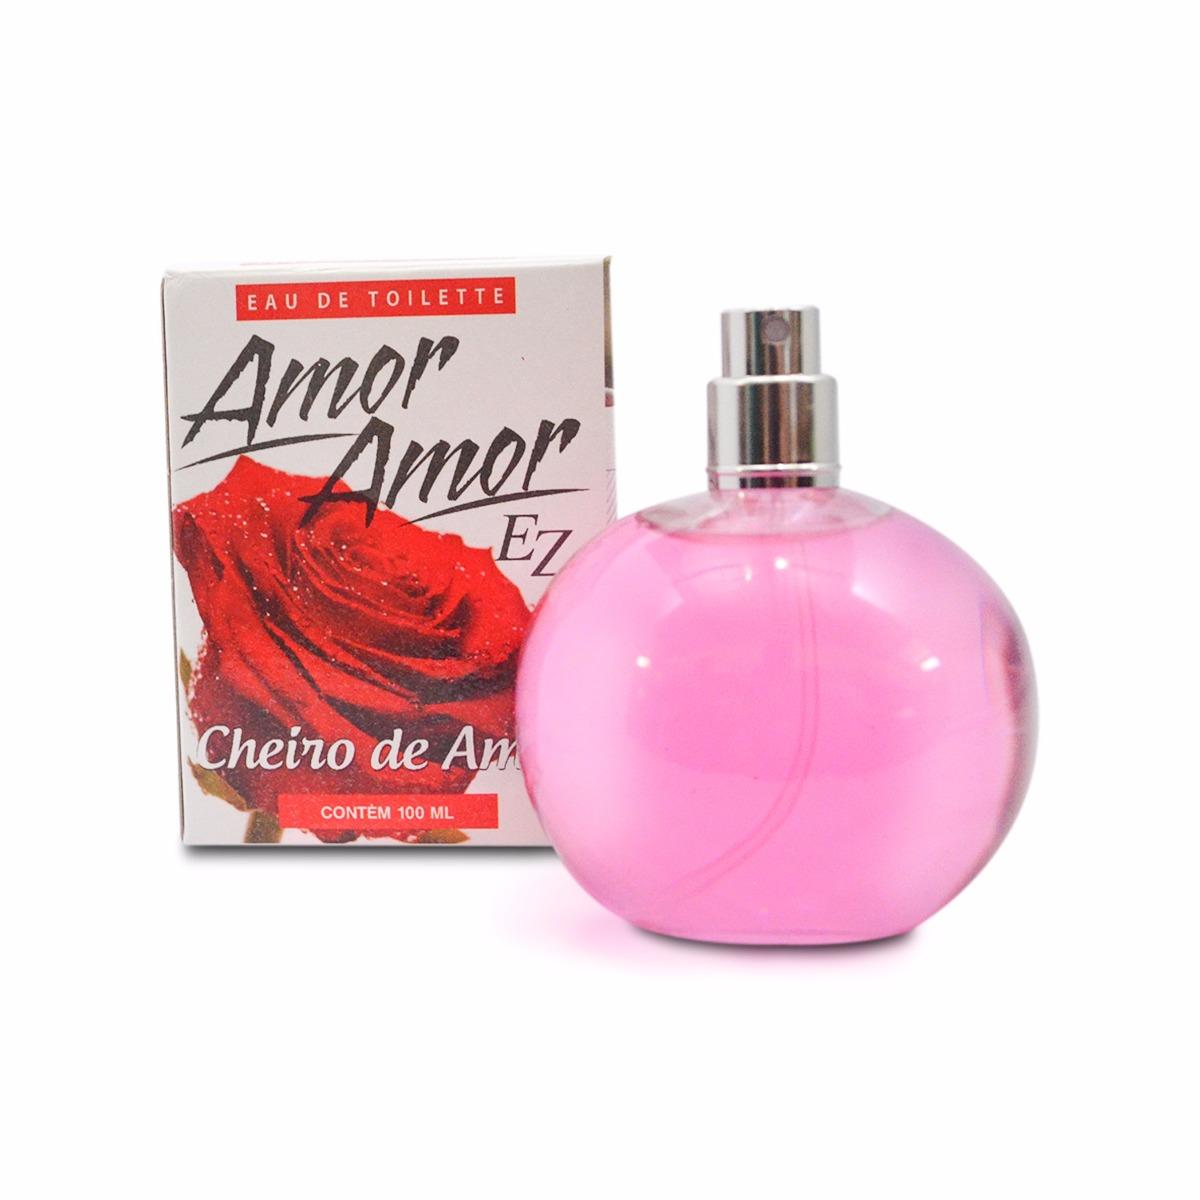 58b42f789 kit perfume cheiro de amor - ez eau toilette - 12 und. Carregando zoom.